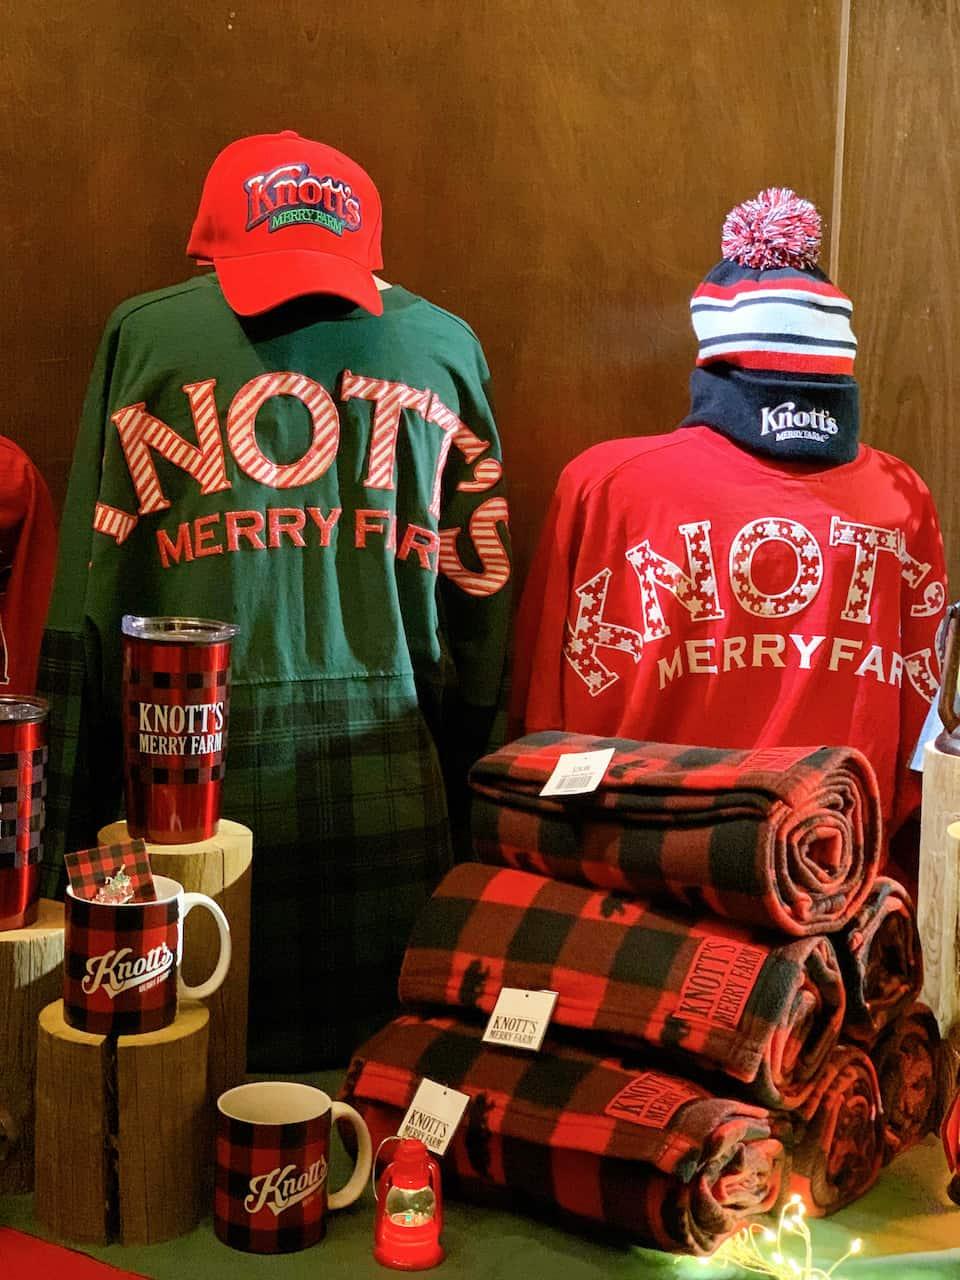 Souveniors Knott's Merry Farm